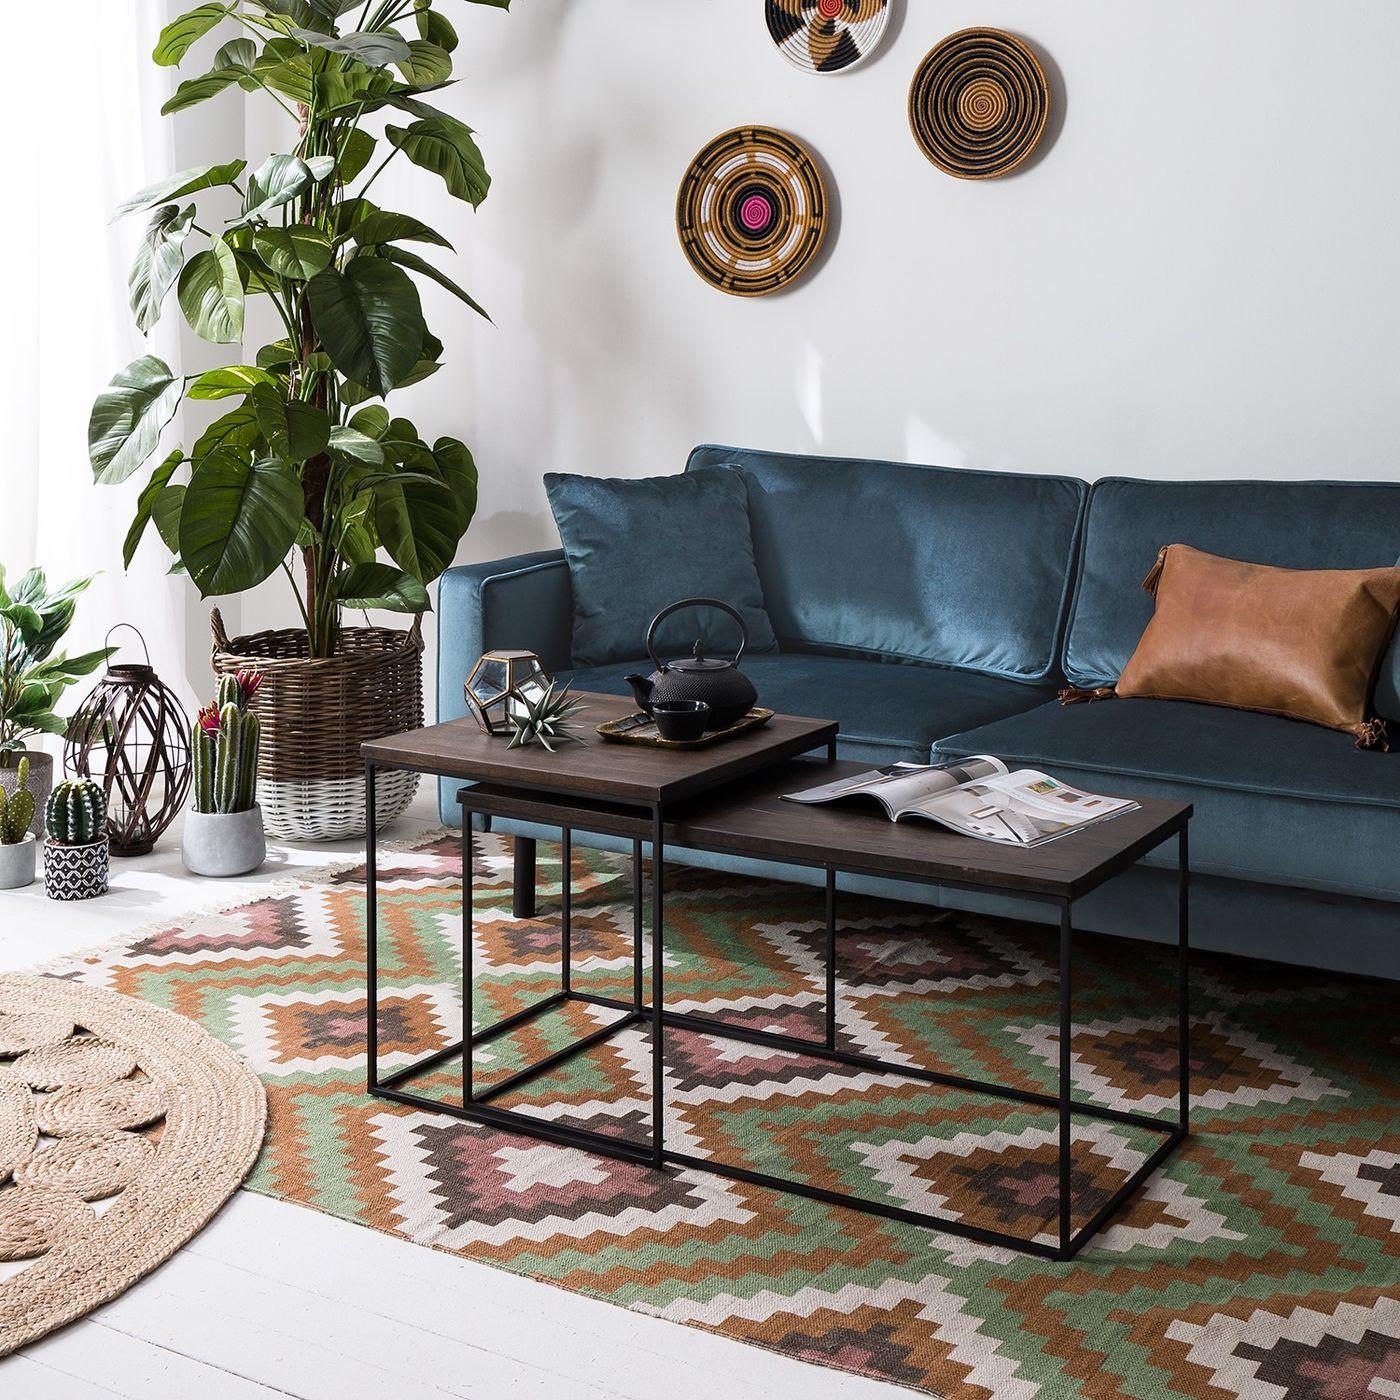 deko ideen f r deinen couchtisch. Black Bedroom Furniture Sets. Home Design Ideas